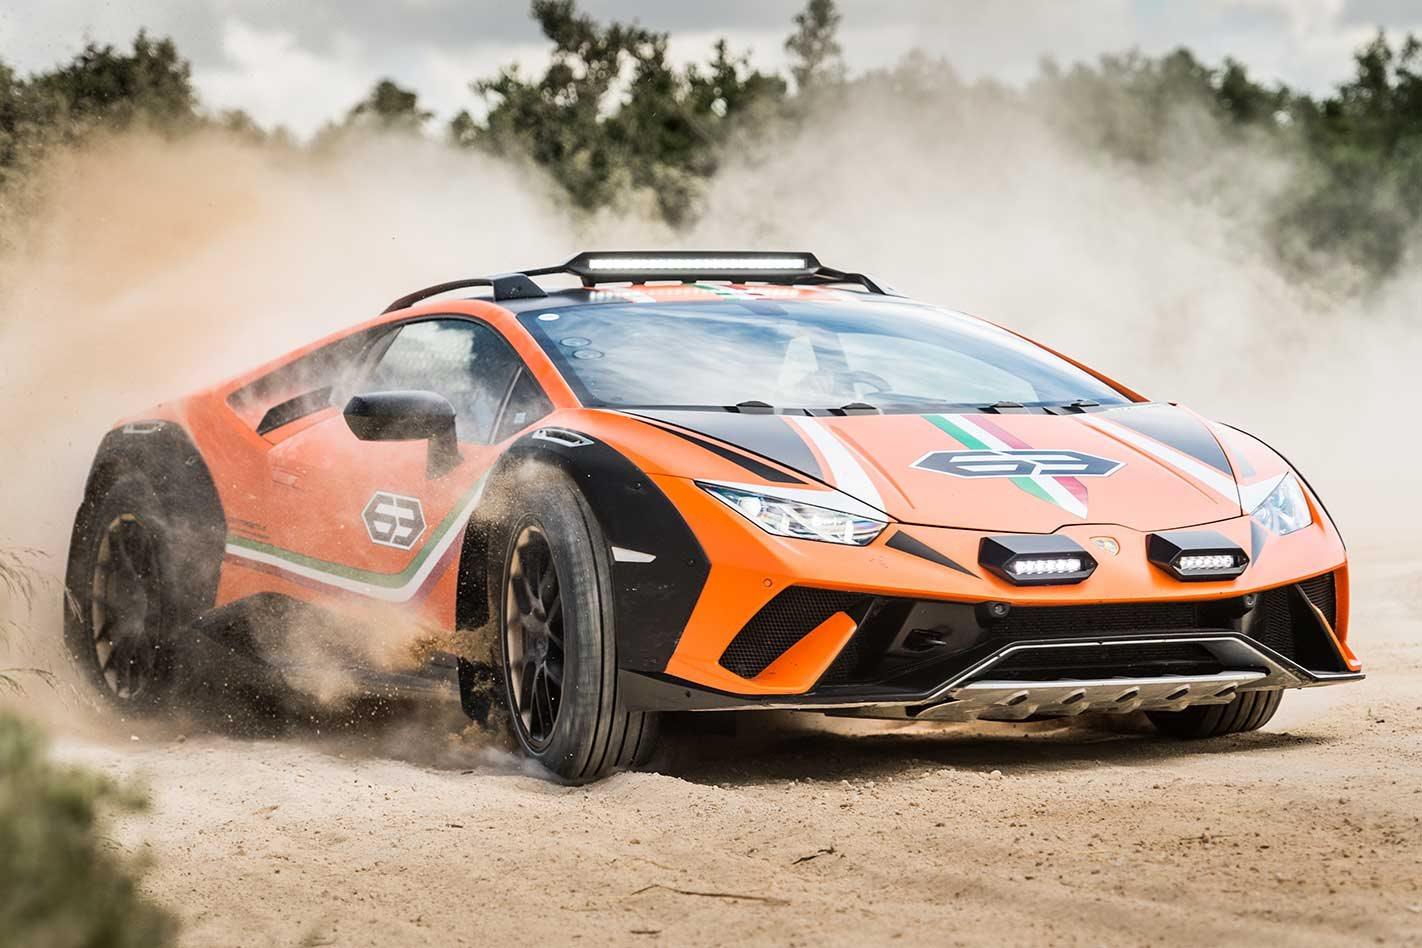 Lamborghini Huracán Sterrato concept review